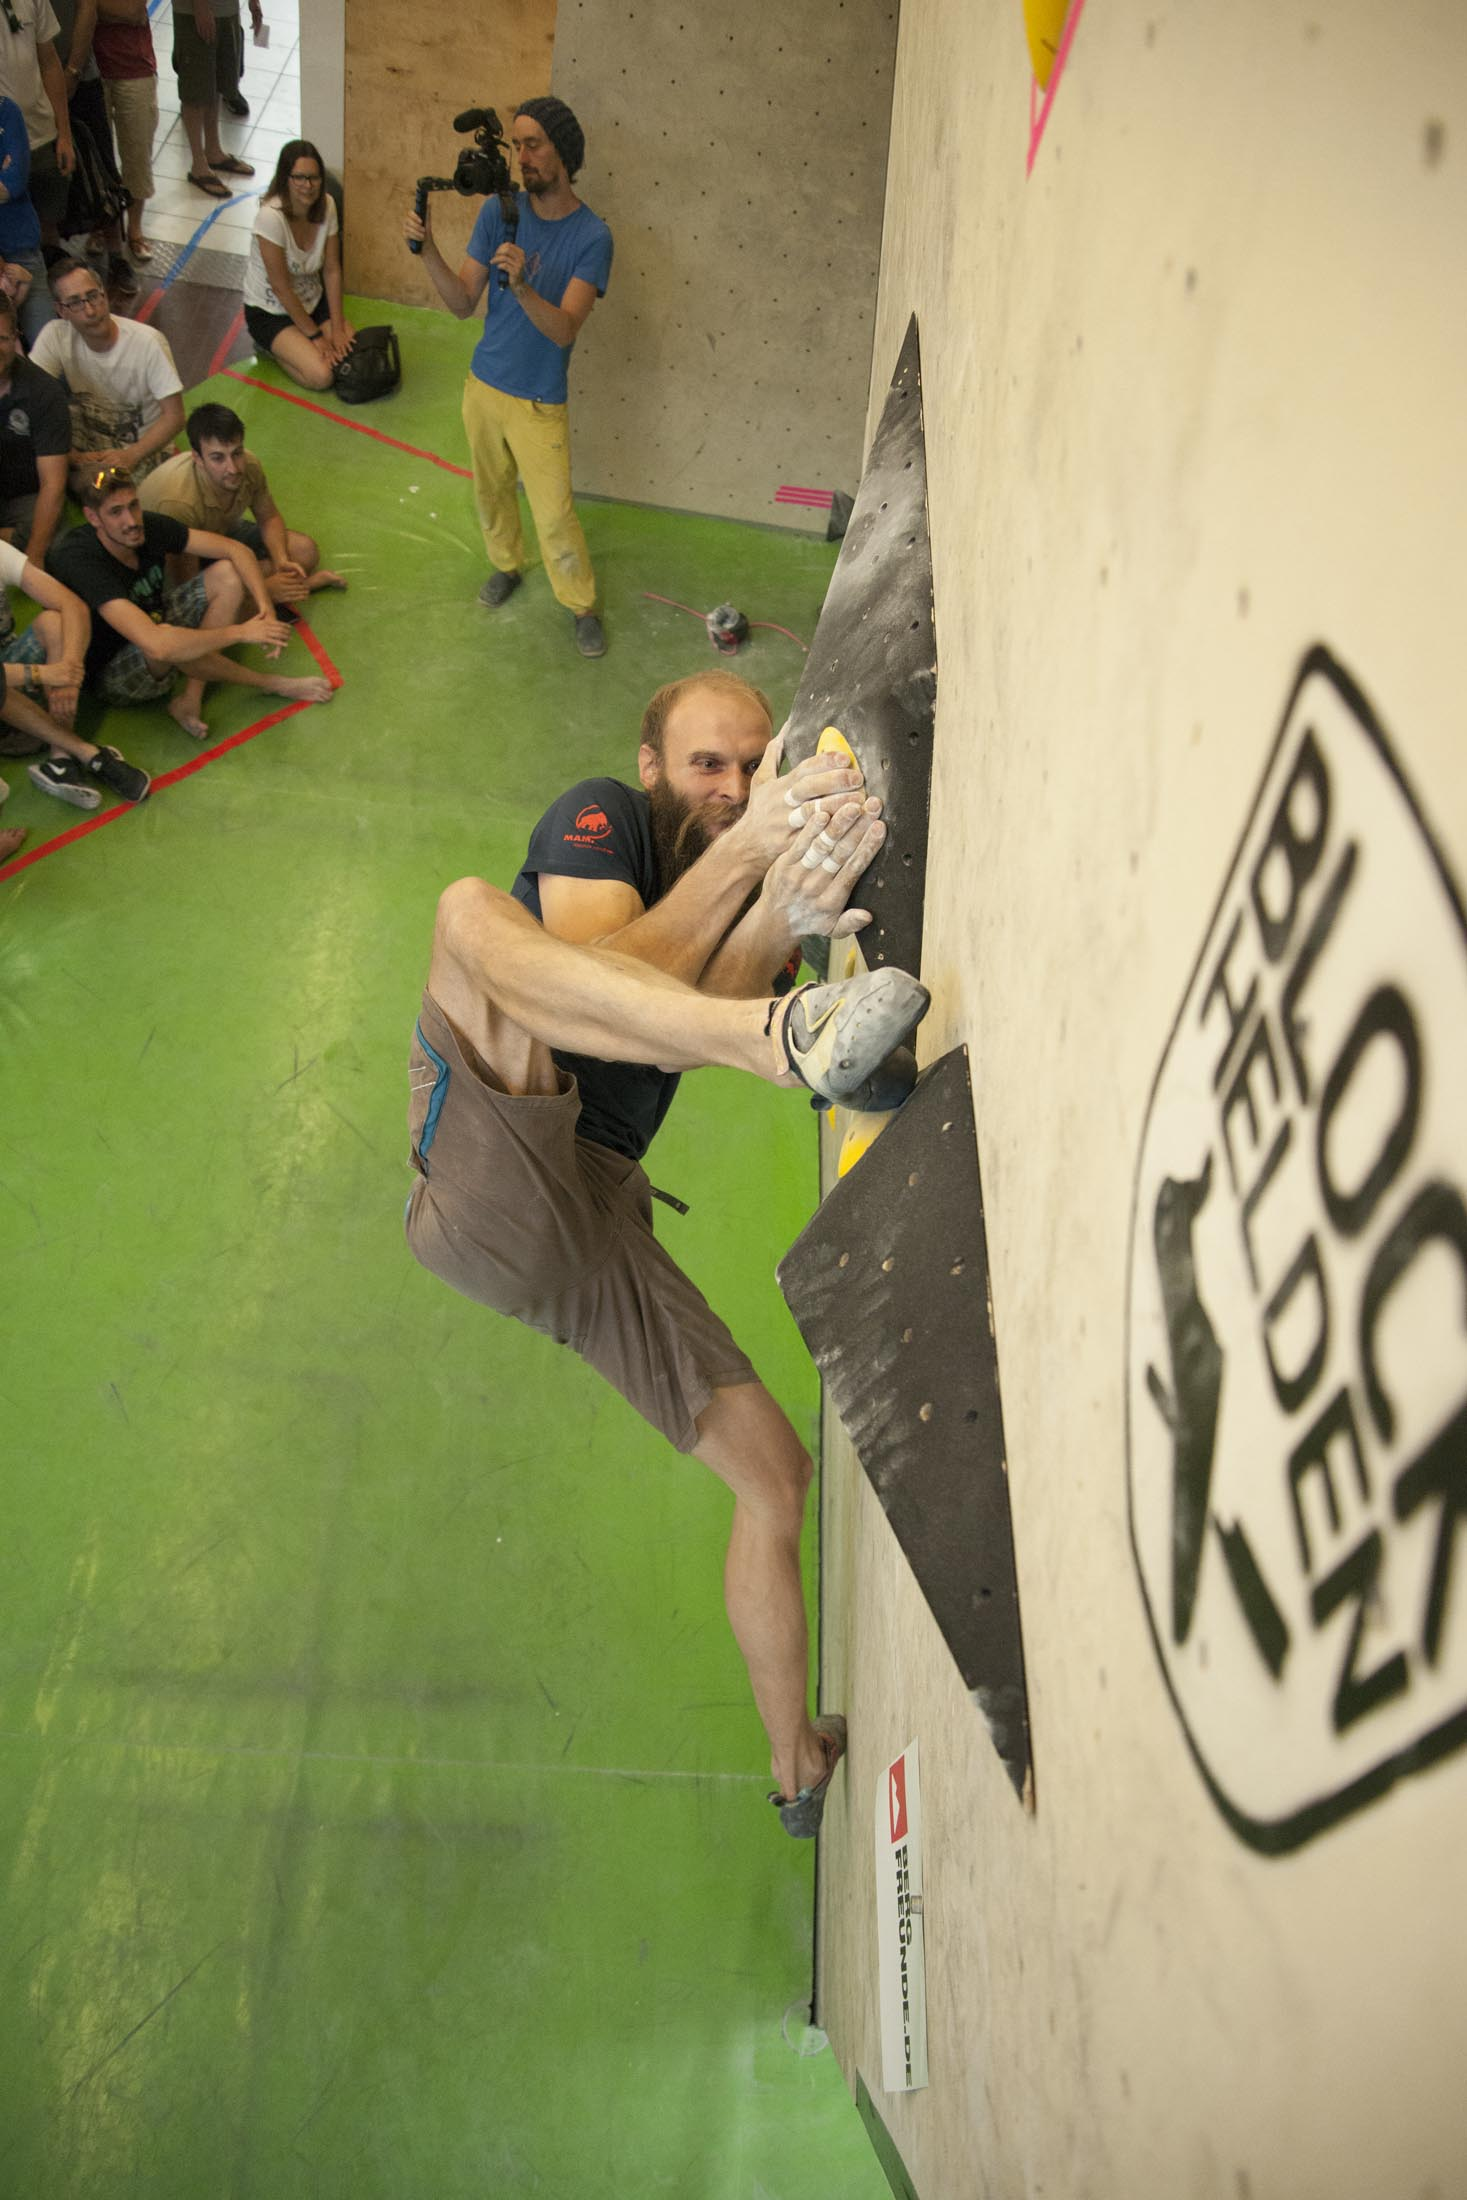 Finale, internationaler bouldercup Frankenjura 2016, BLOCKHELDEN Erlangen, Mammut, Bergfreunde.de, Boulderwettkampf07092016519